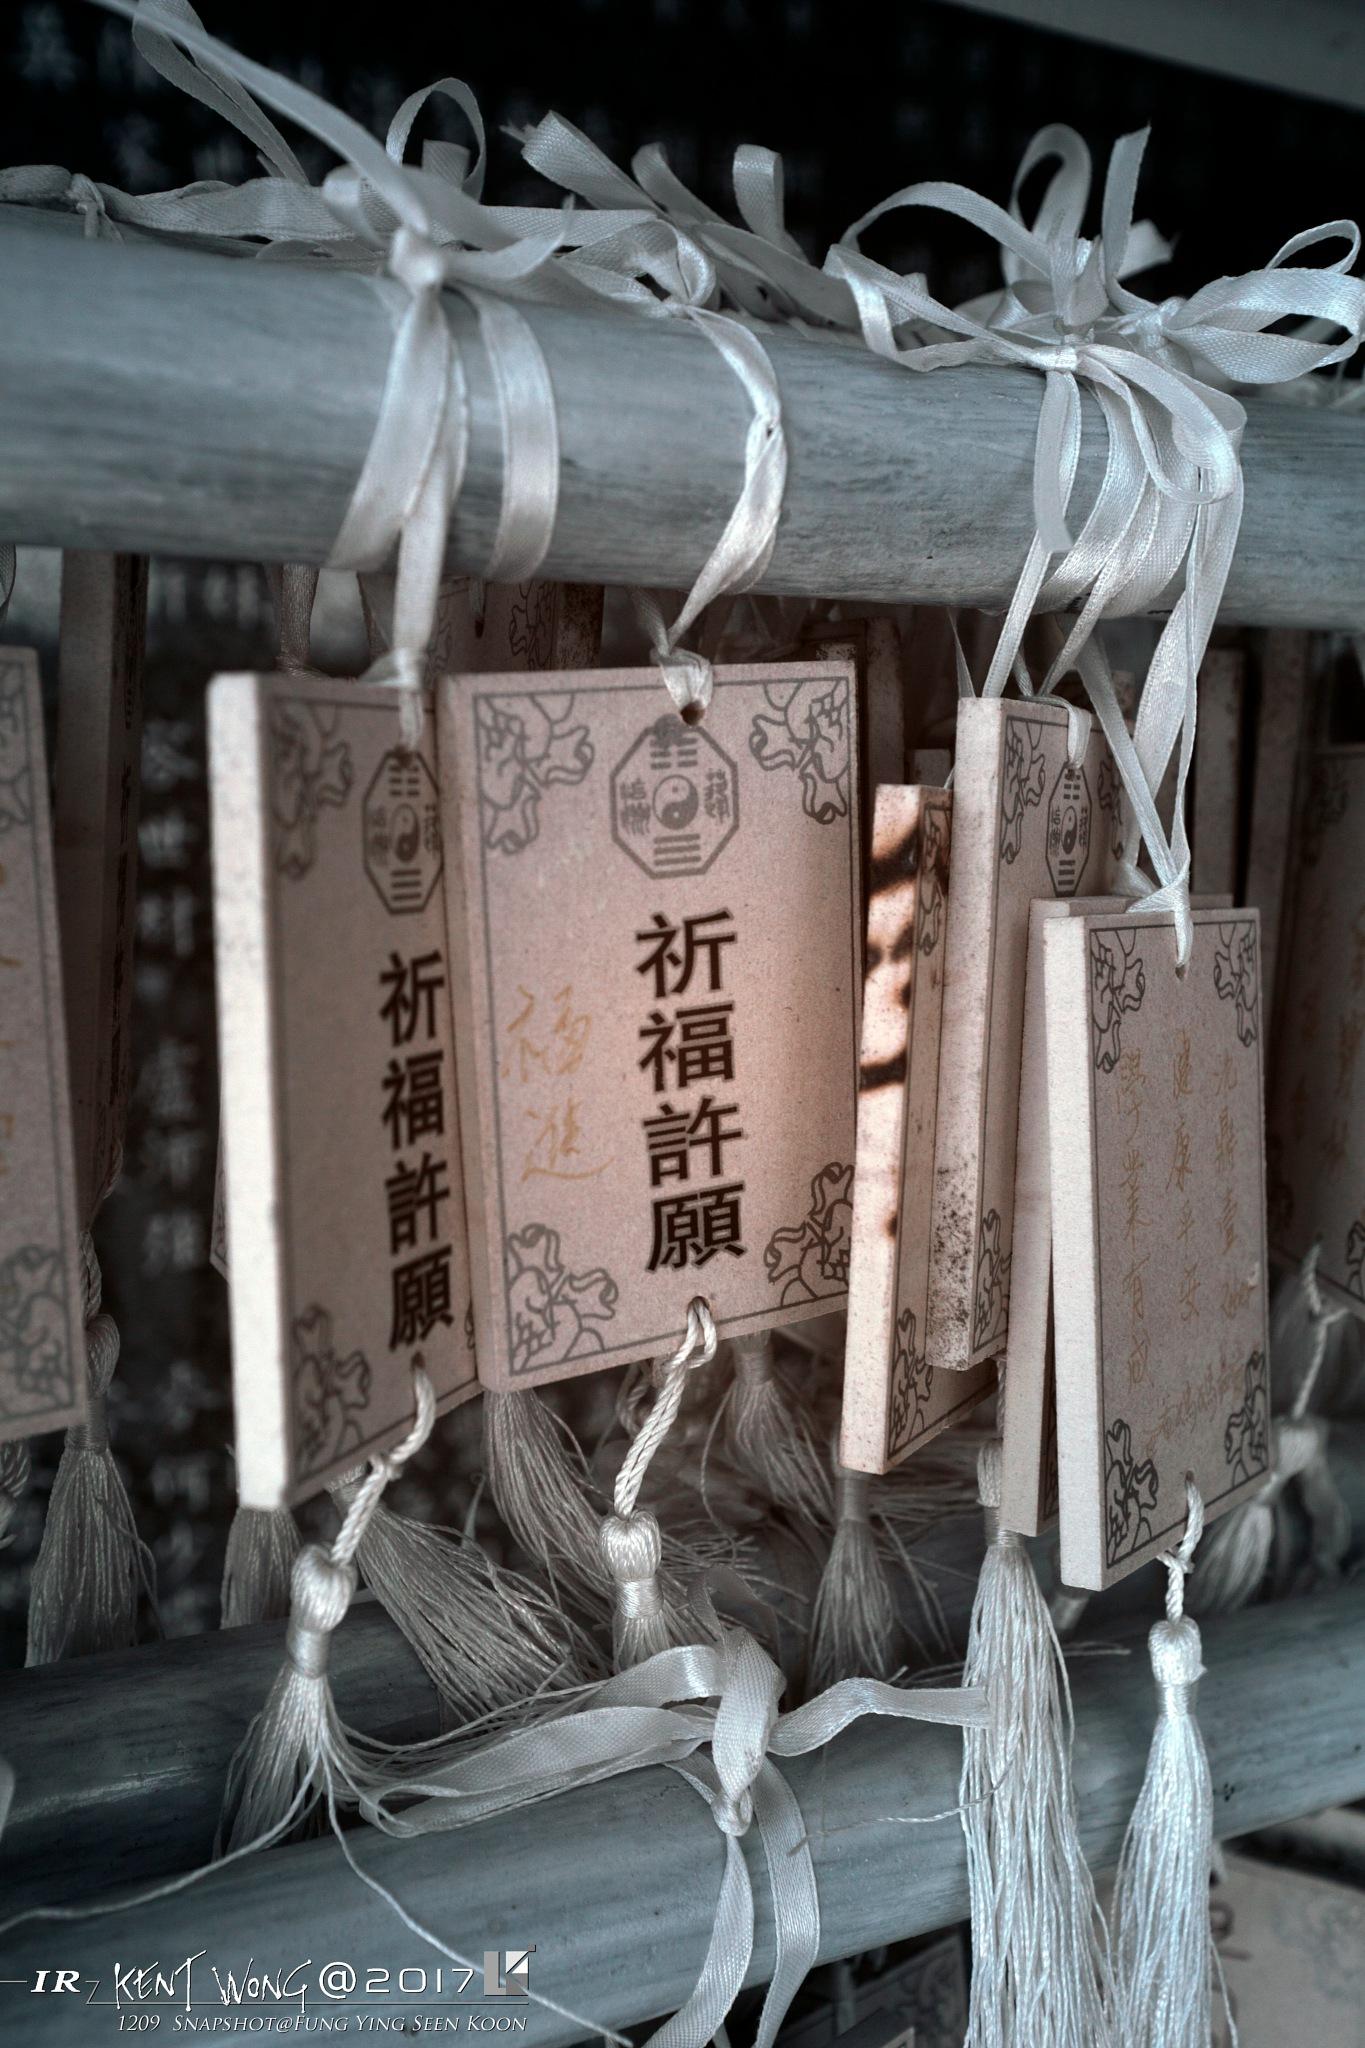 Make A Wish by ken wong